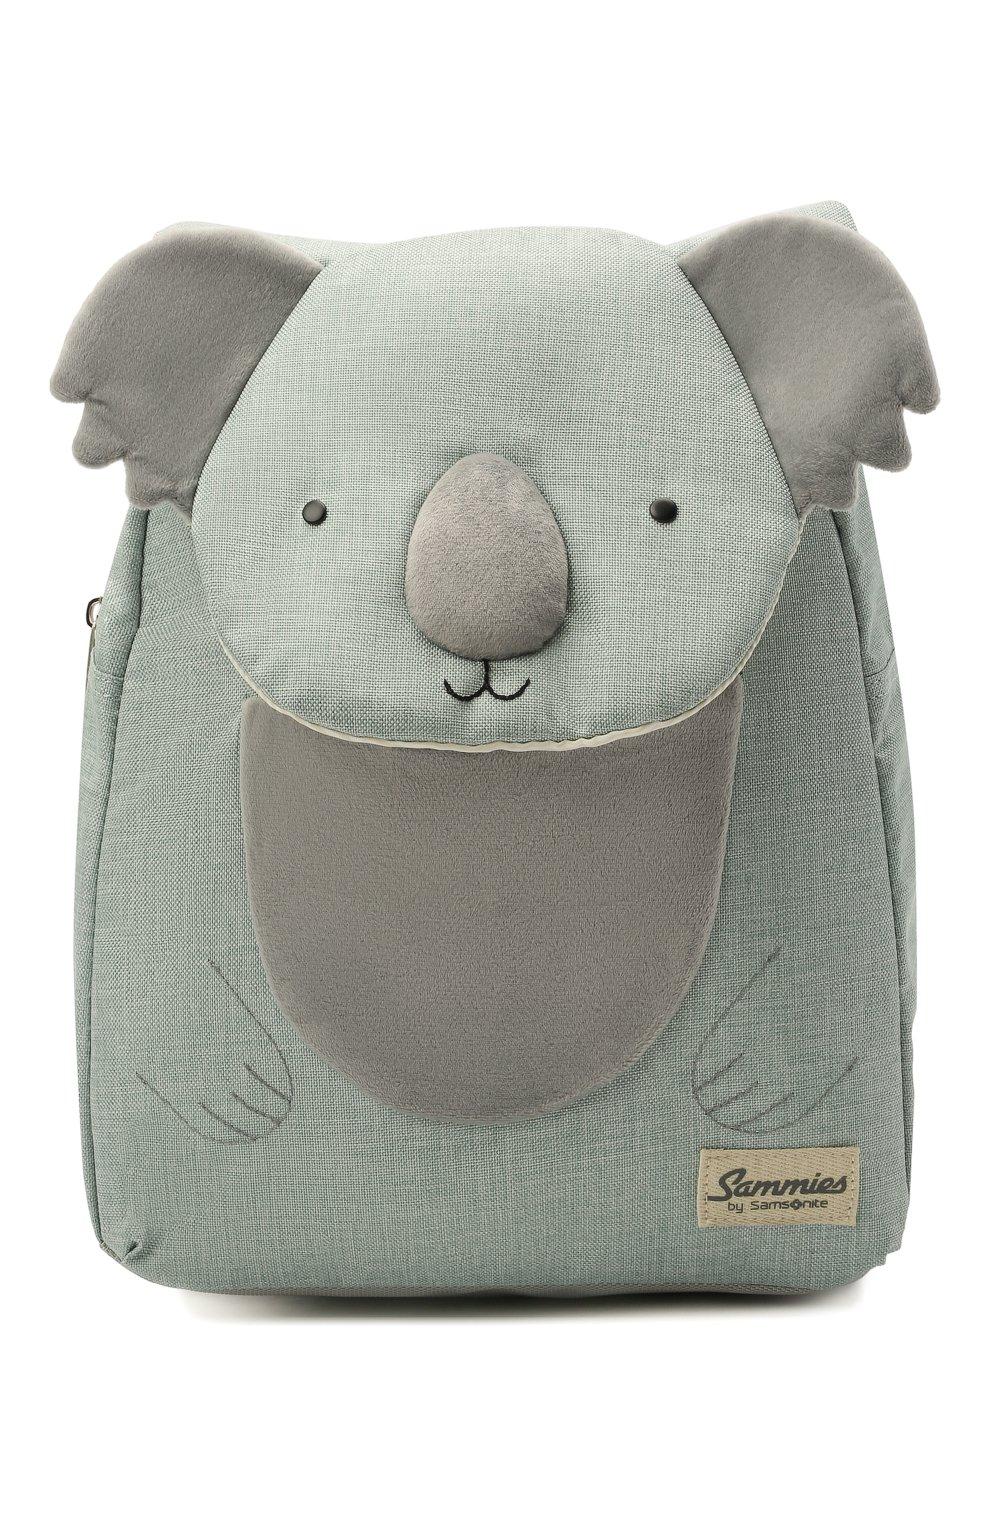 Детская рюкзак happy sammies SAMSONITE светло-зеленого цвета, арт. CD0-14038   Фото 1 (Материал: Текстиль)